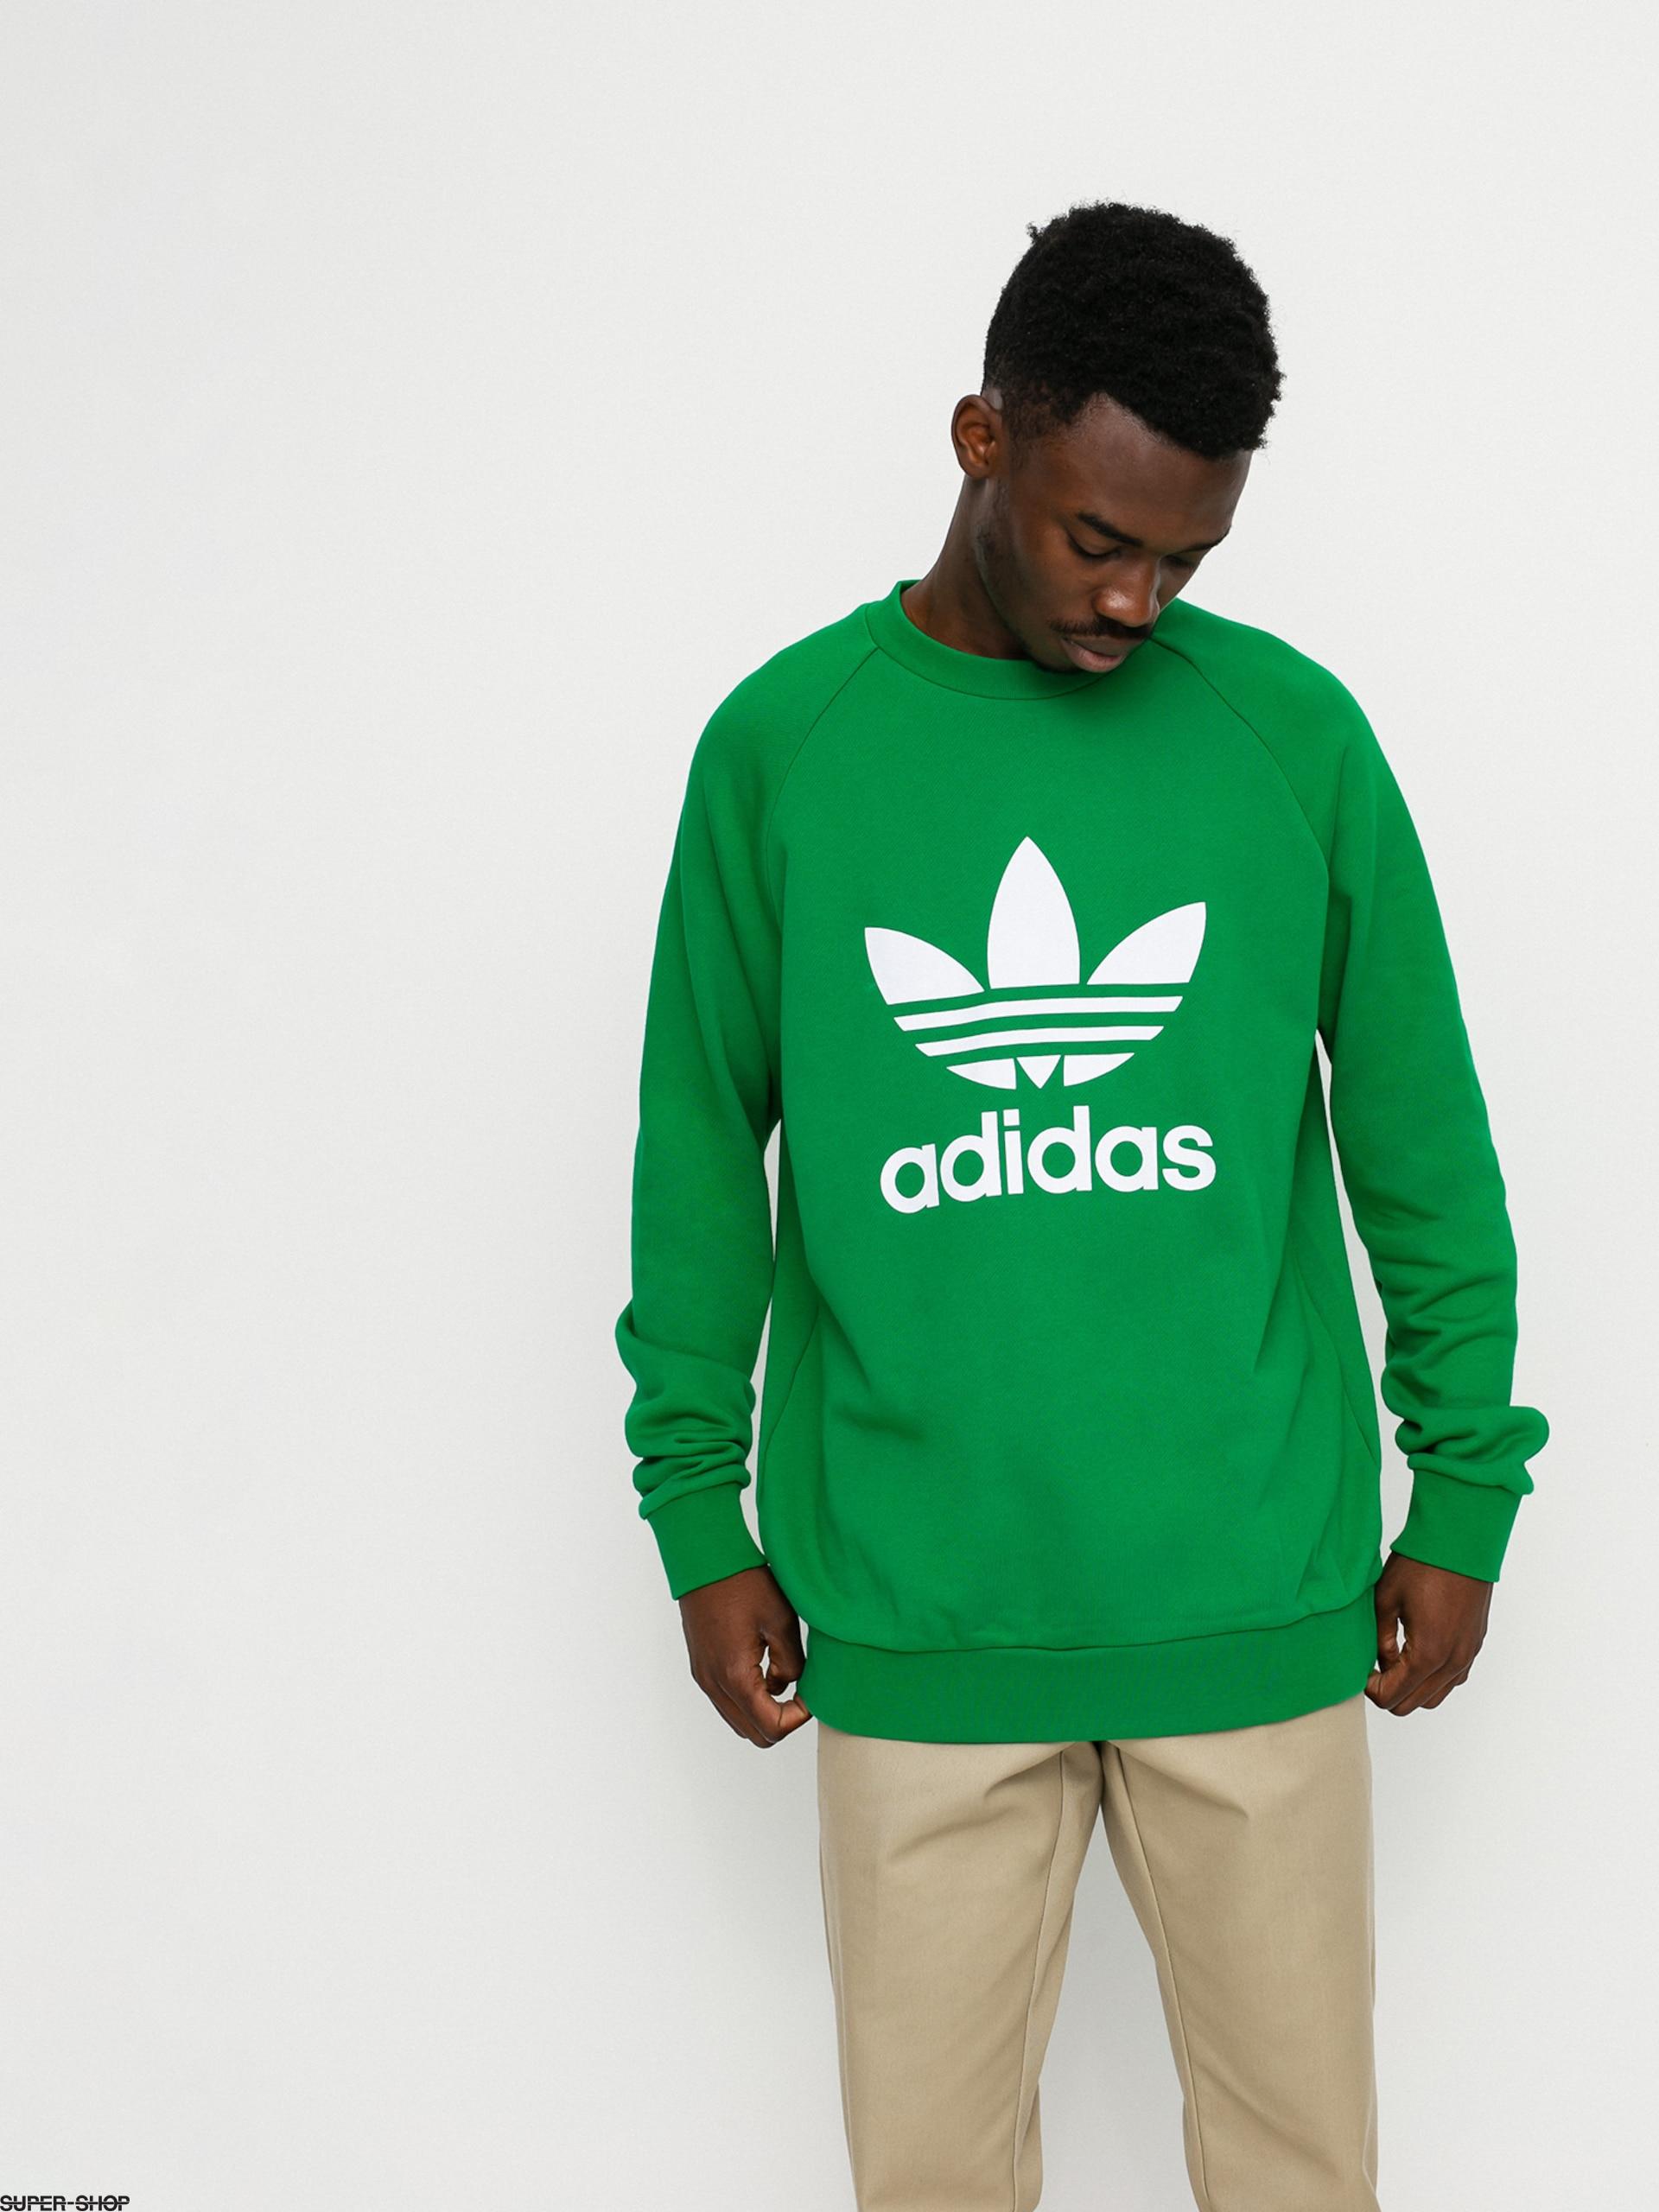 adidas Originals Trefoil Sweatshirt (green/white)